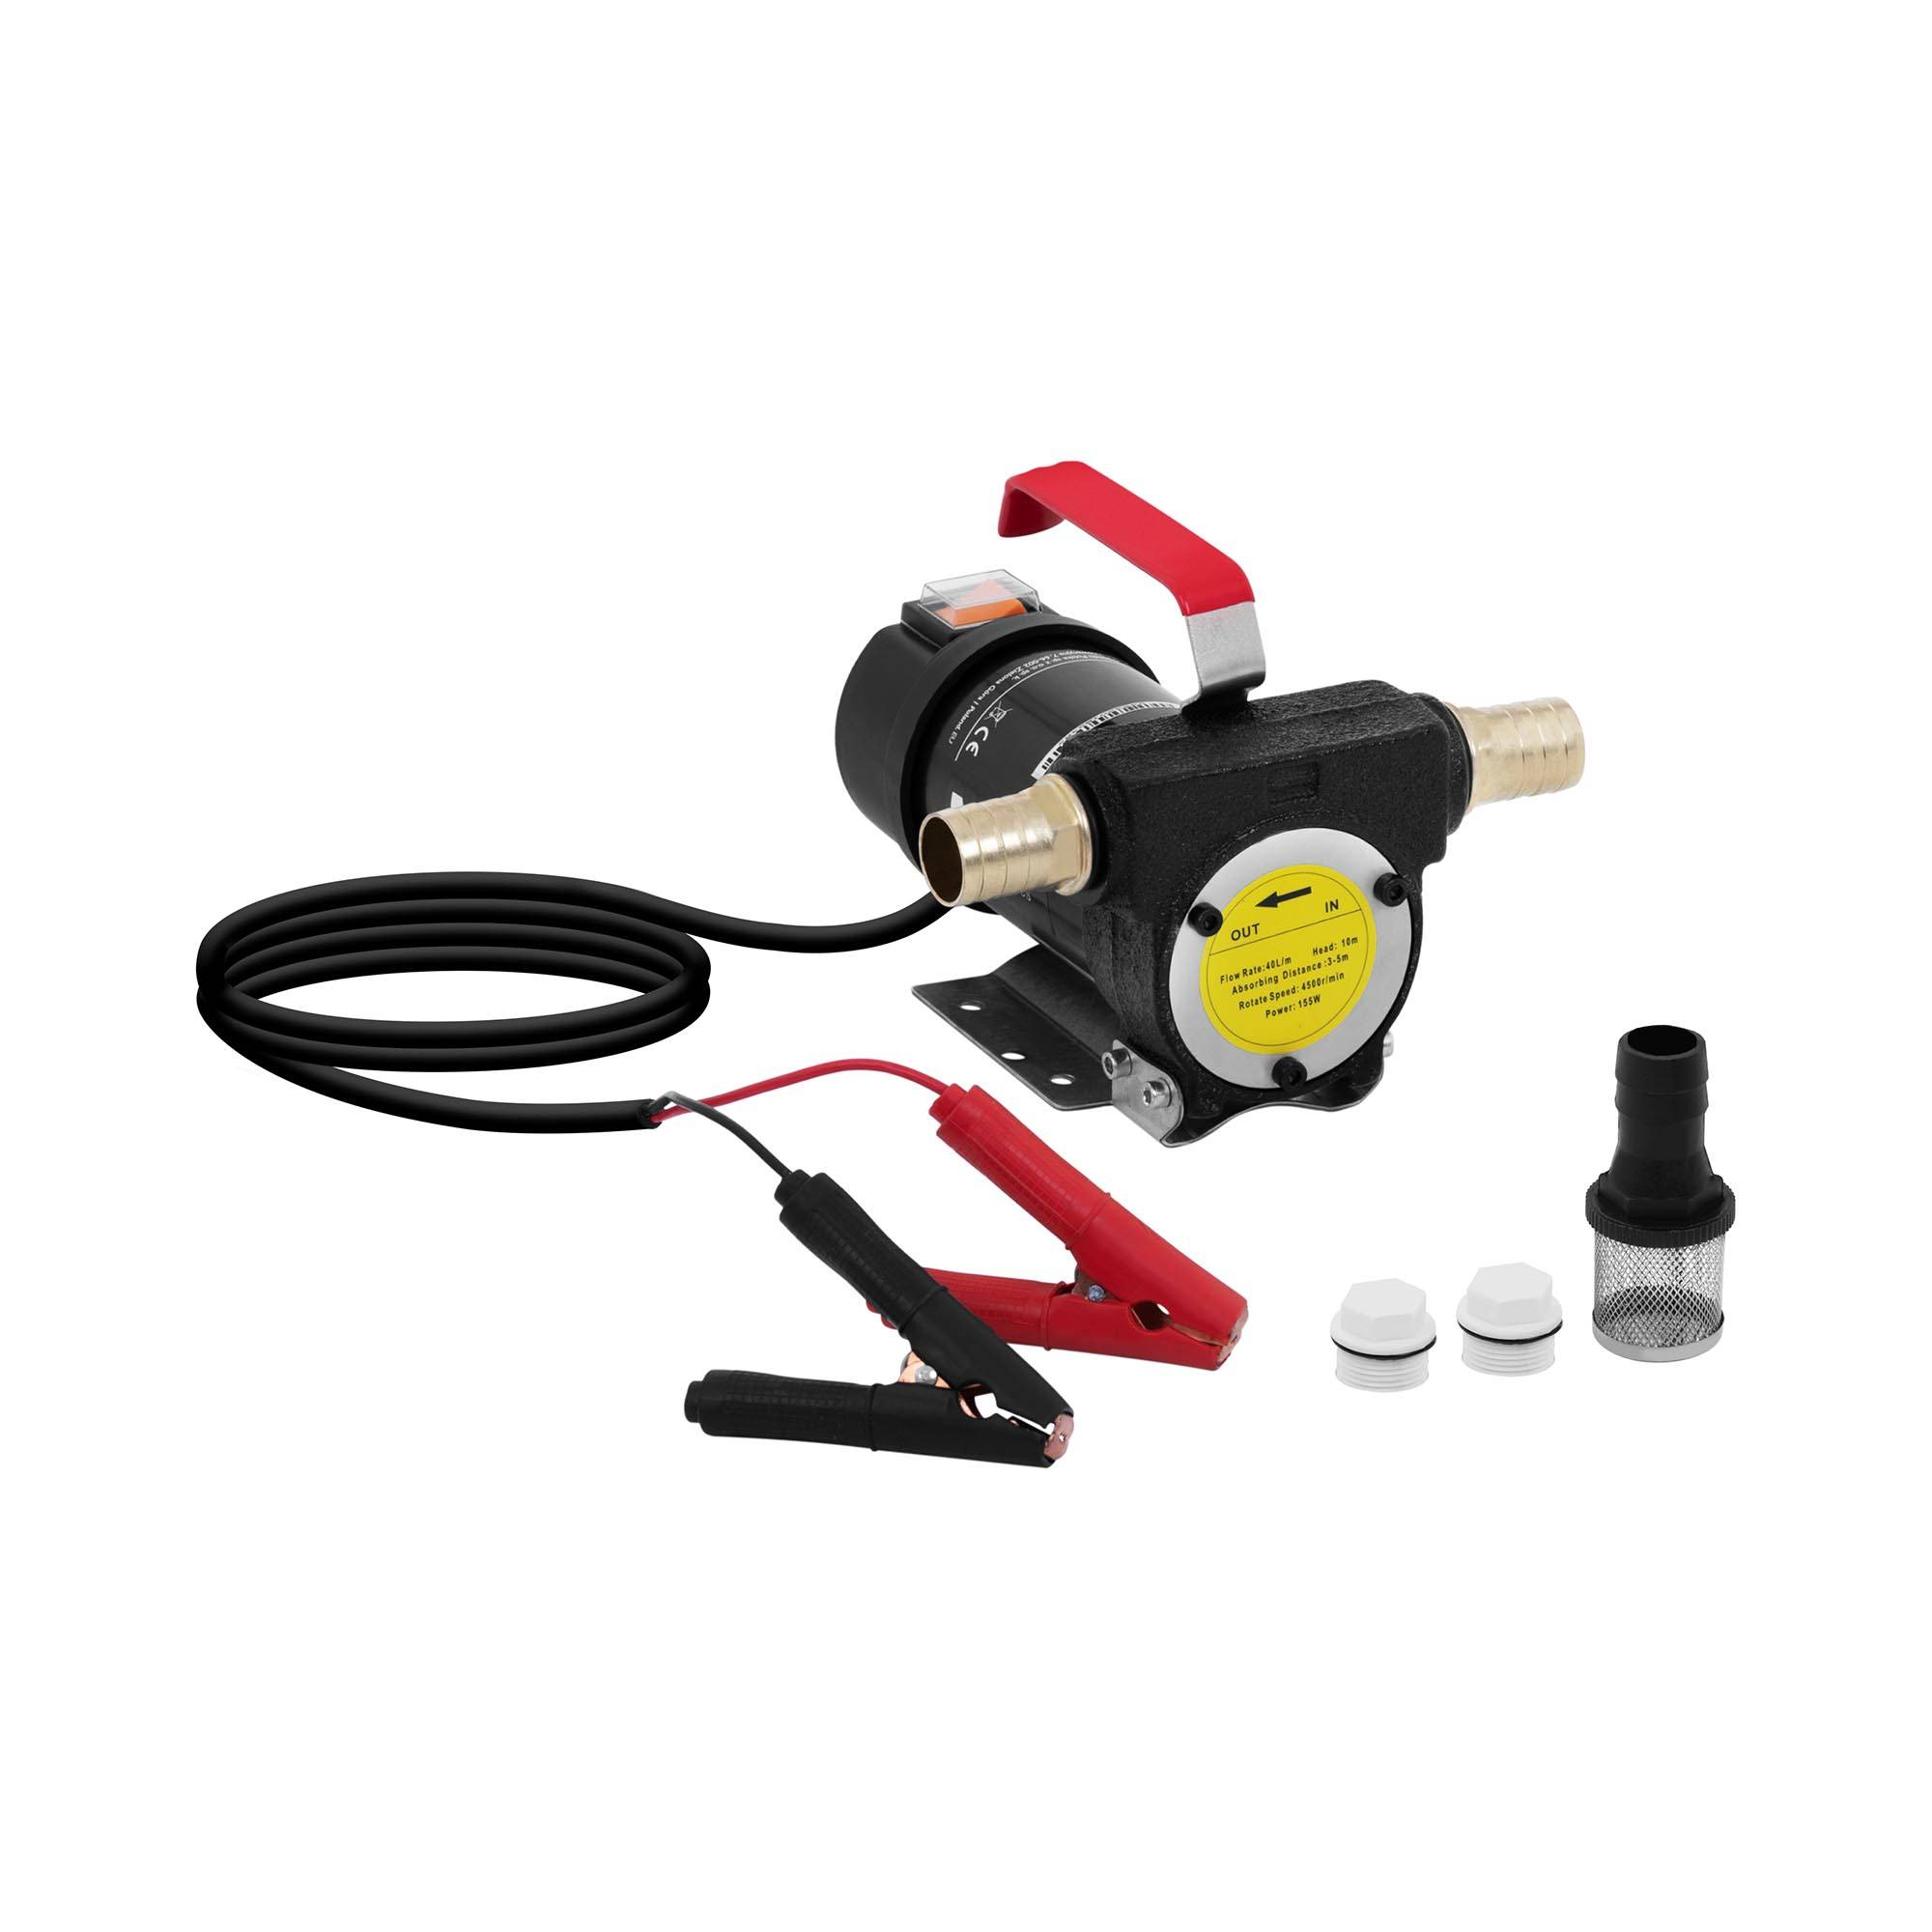 MSW Elektrisk oljeskiftpumpe - 12 V - 40 L/min 10060821